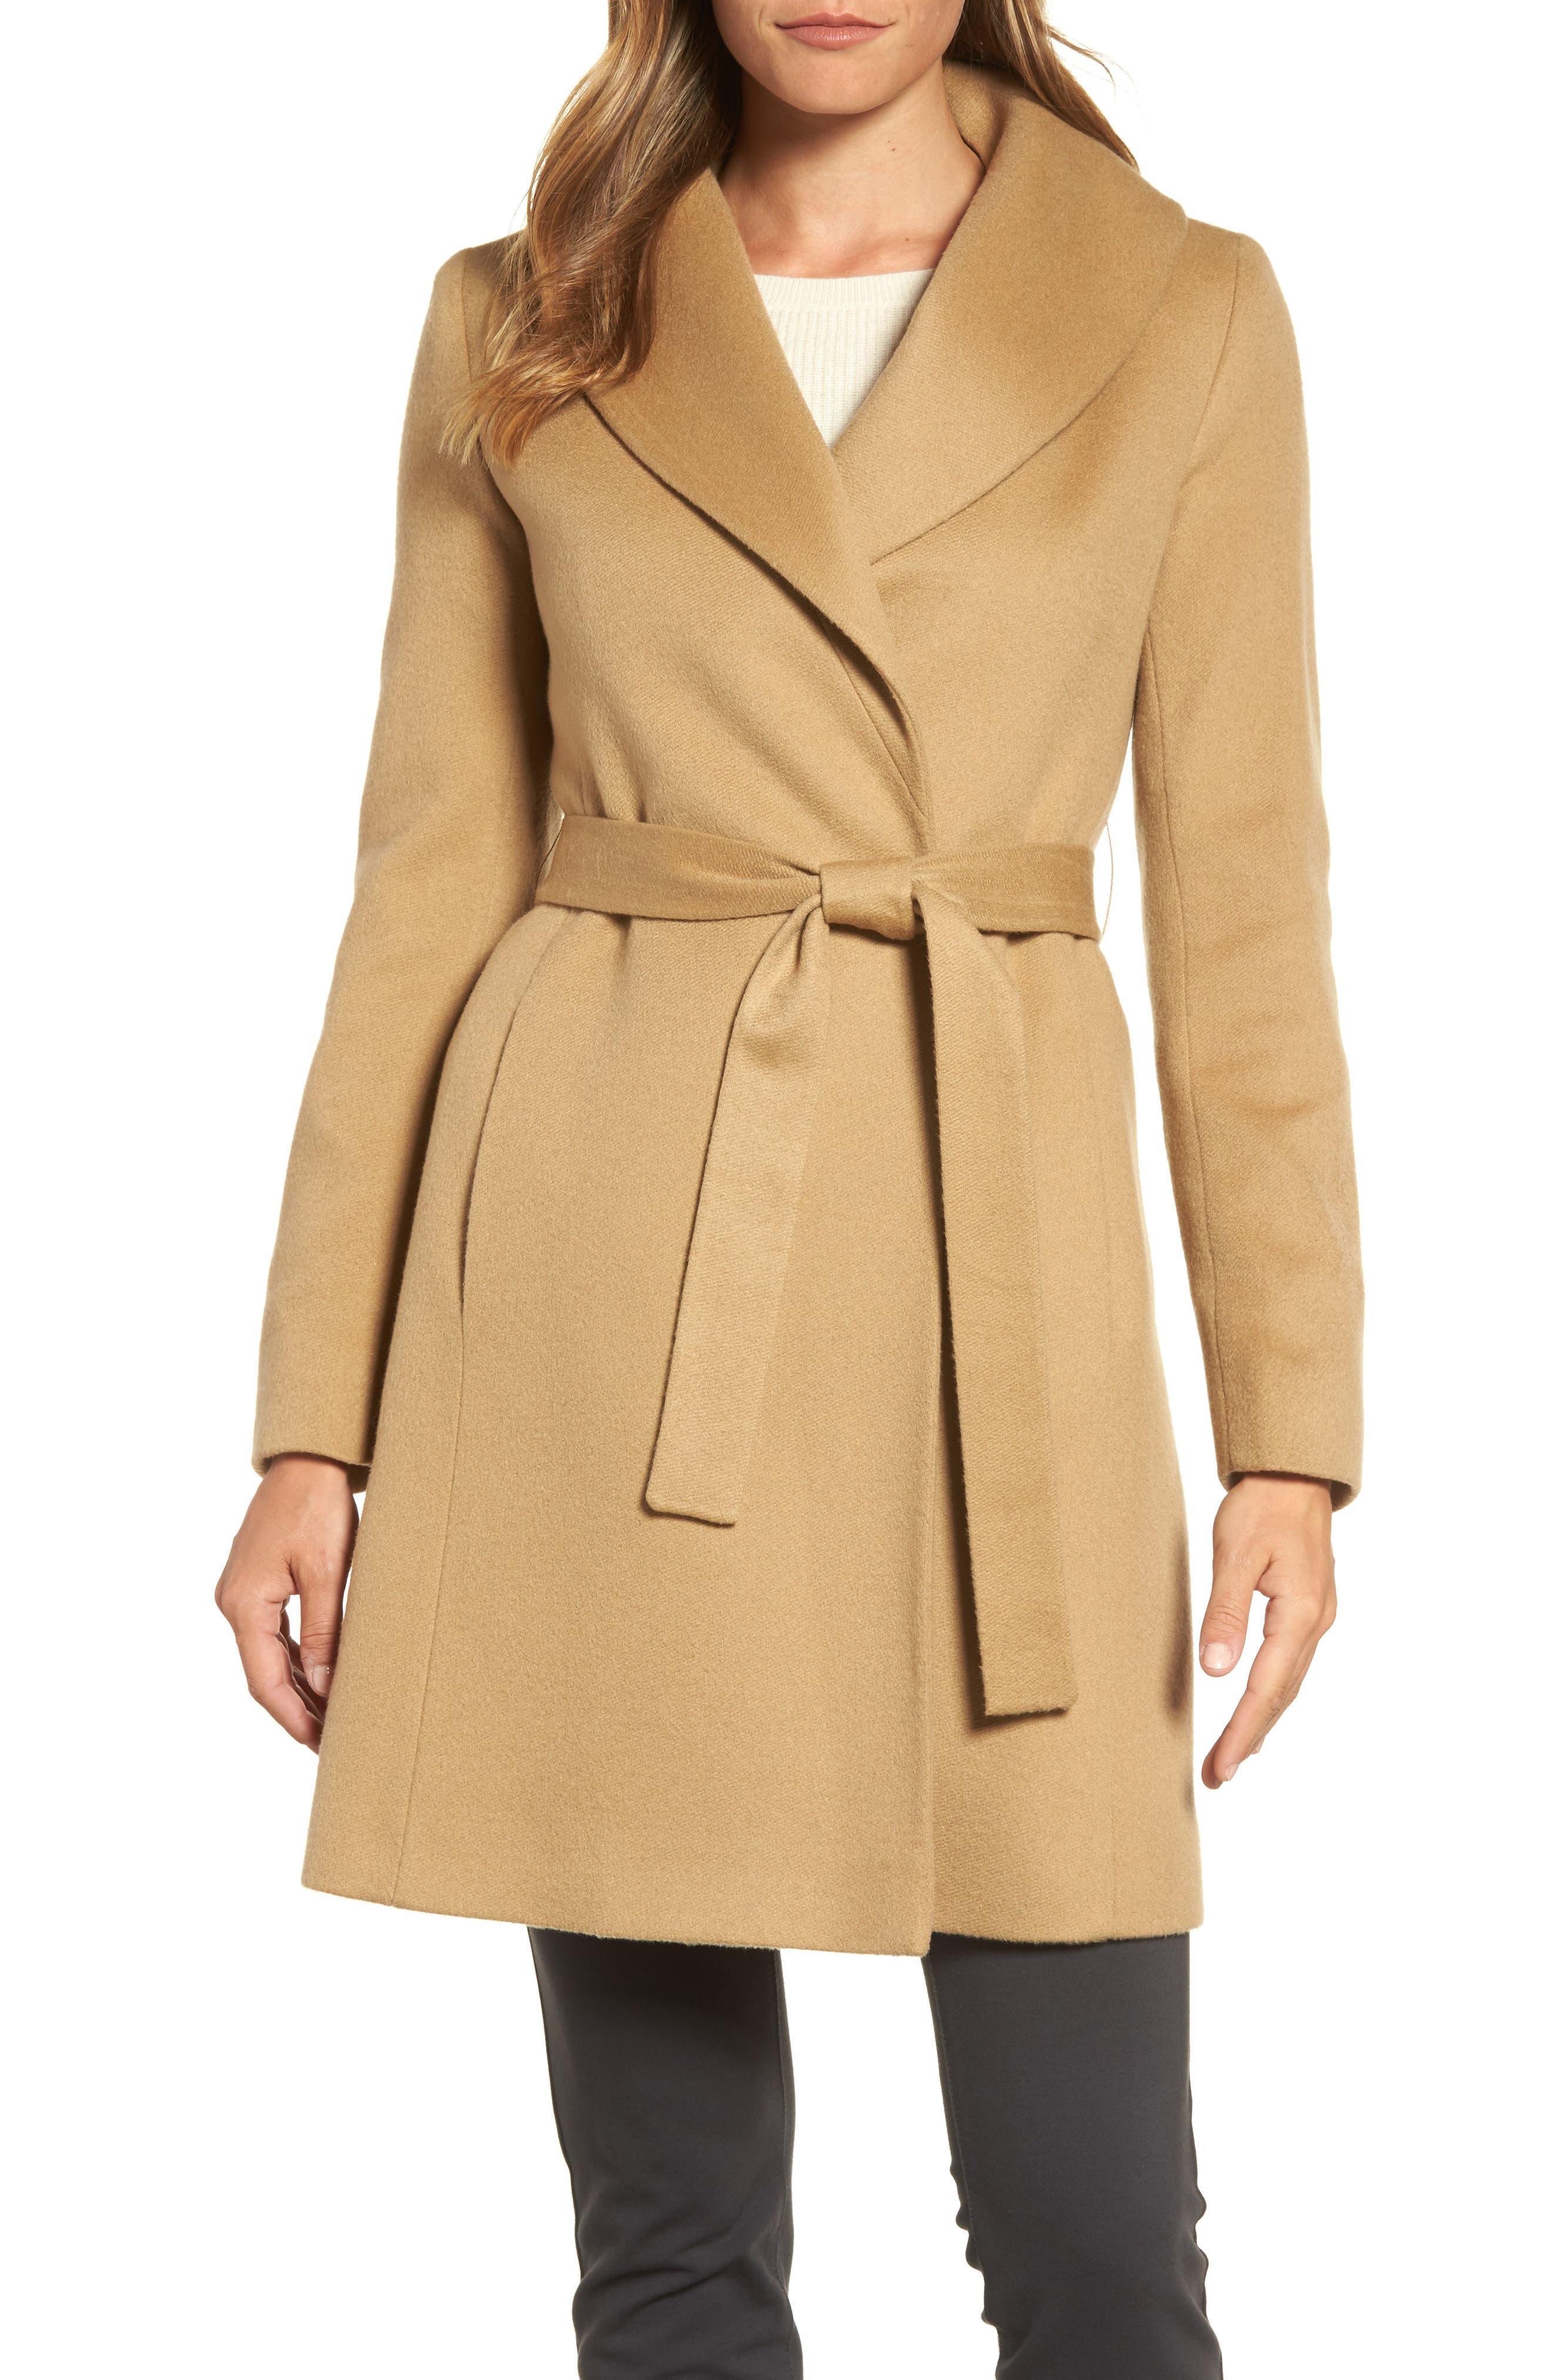 Alternate Image 1 Selected - Fleurette Shawl Collar Cashmere Wrap Coat